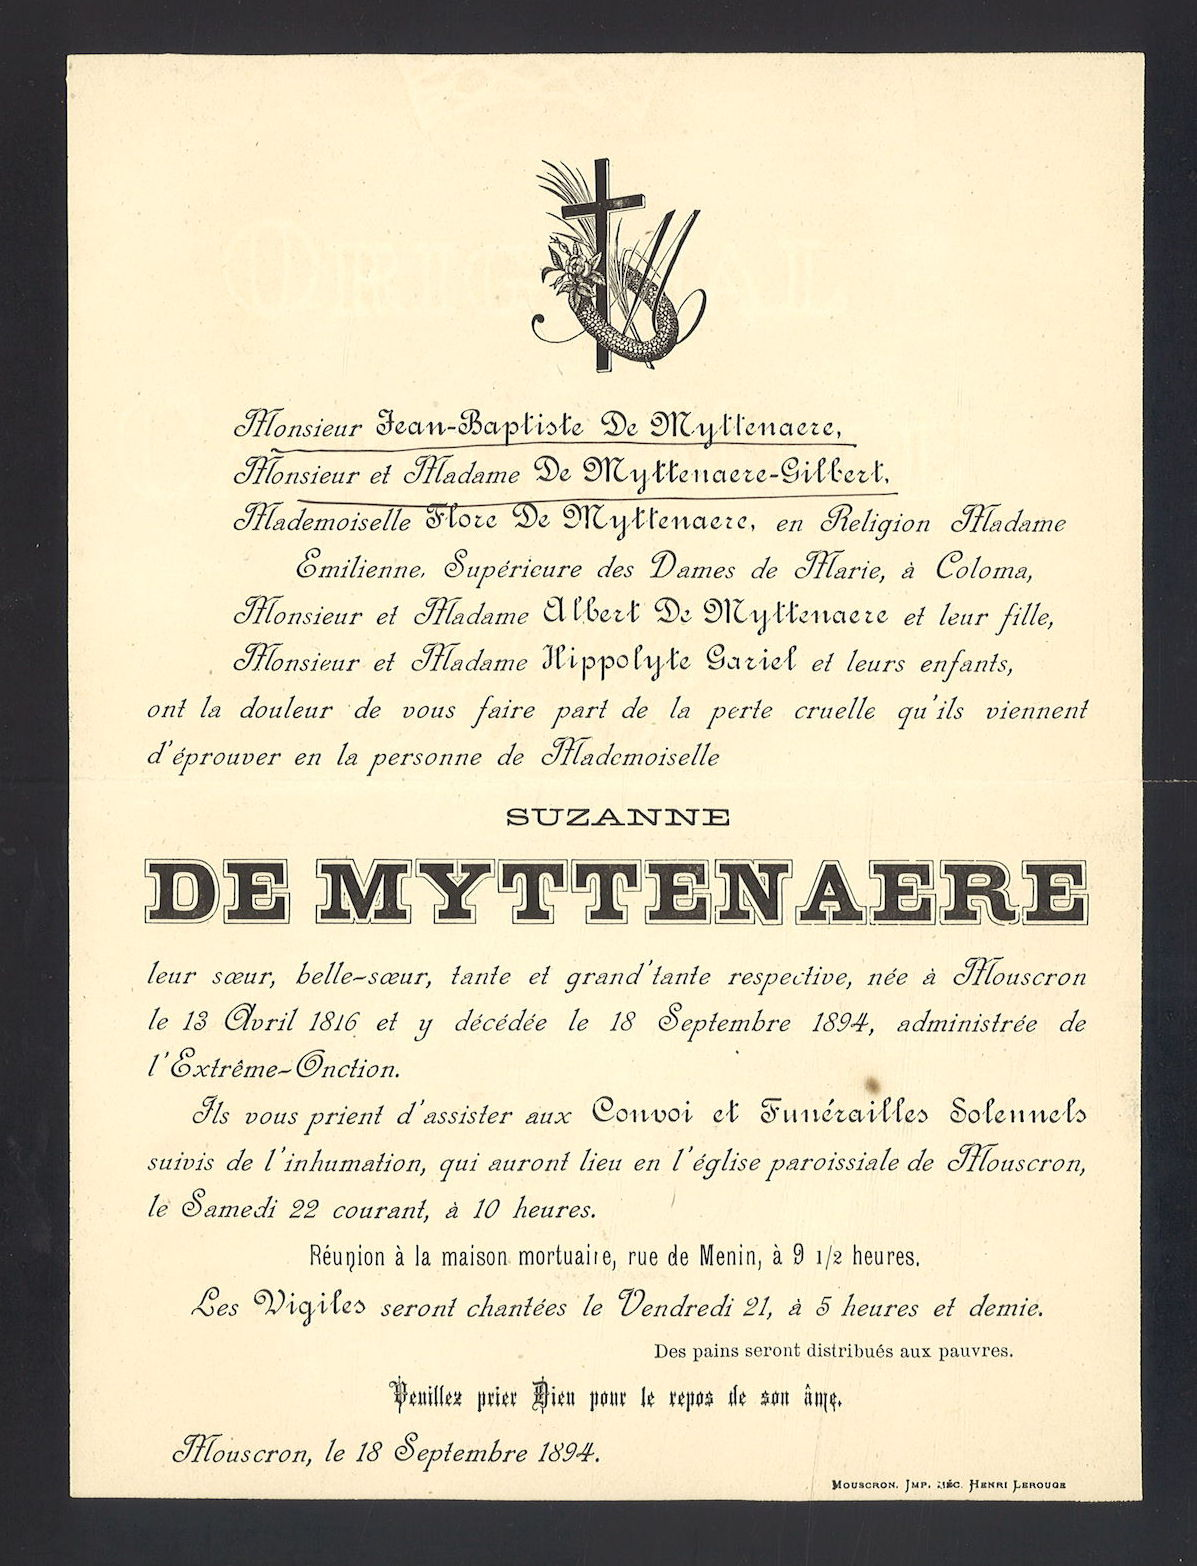 Suzanne De Myttenaere